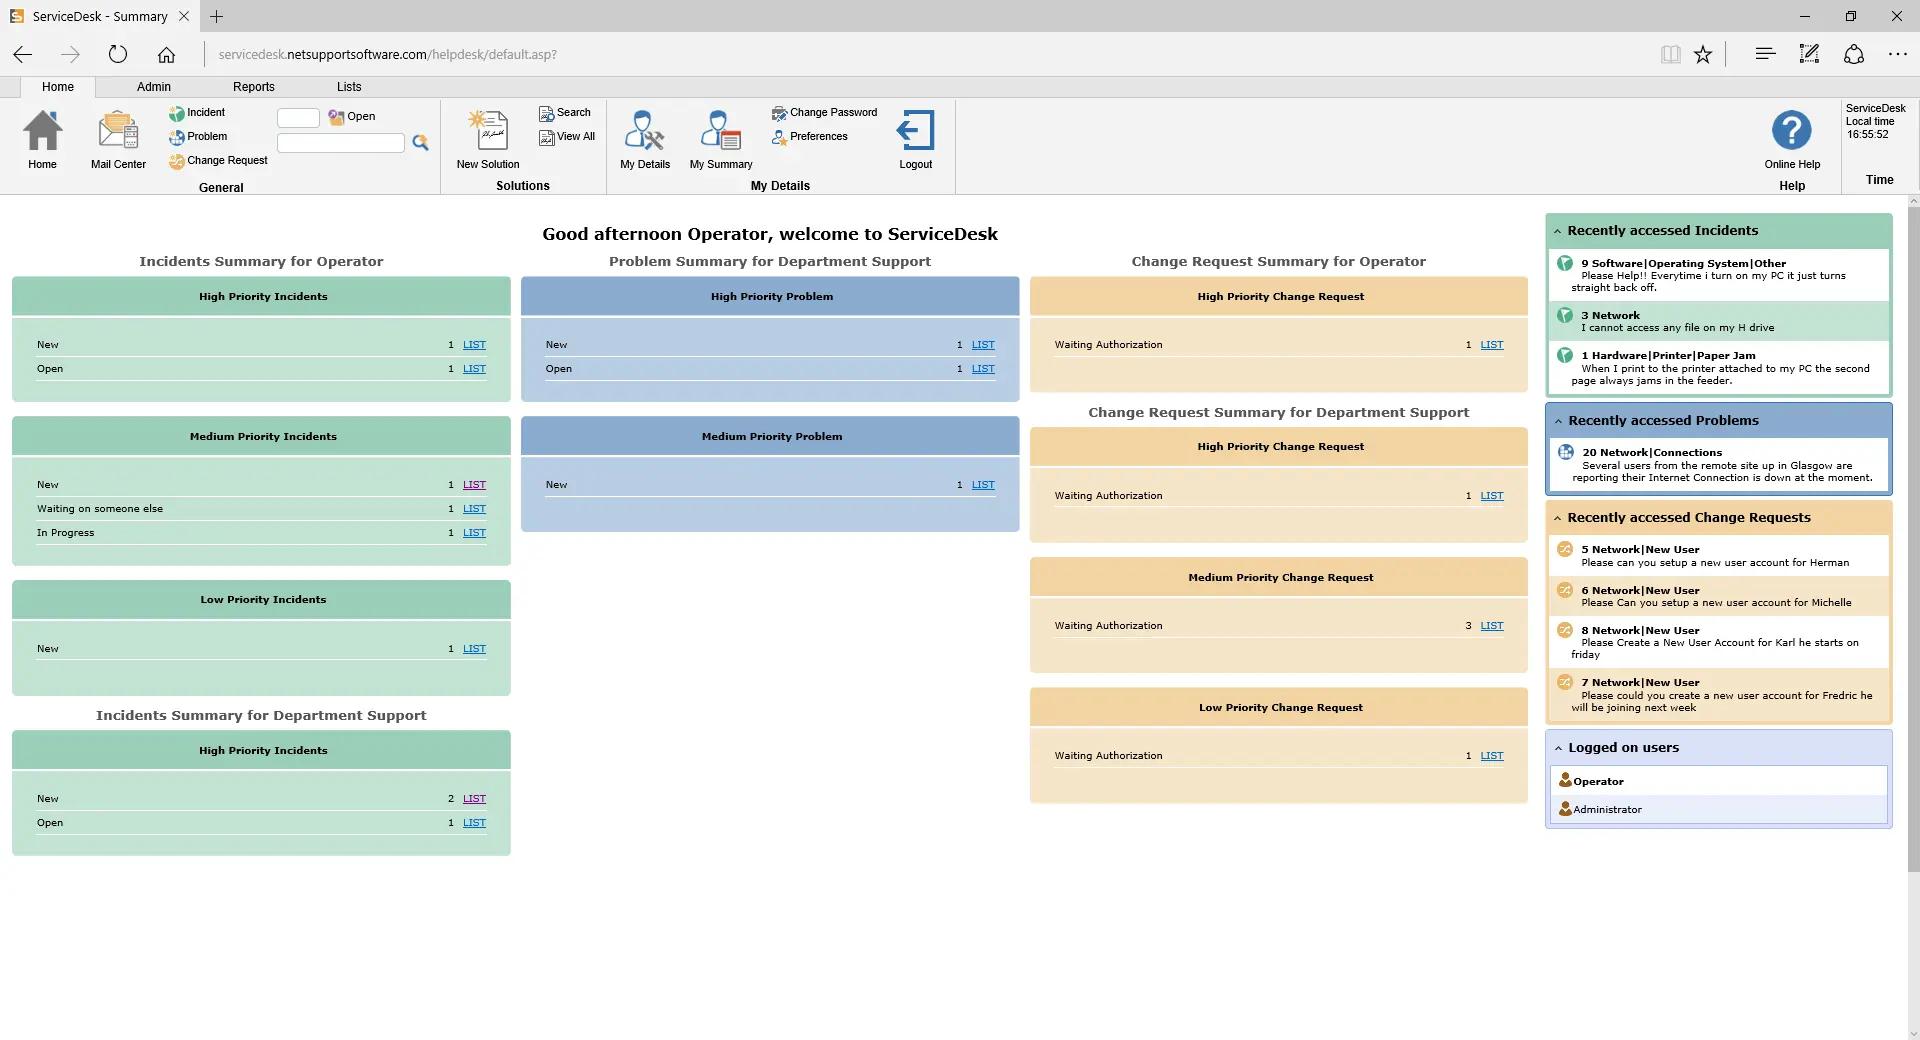 NetSupport ServiceDesk - Summary view of helpdesk activity